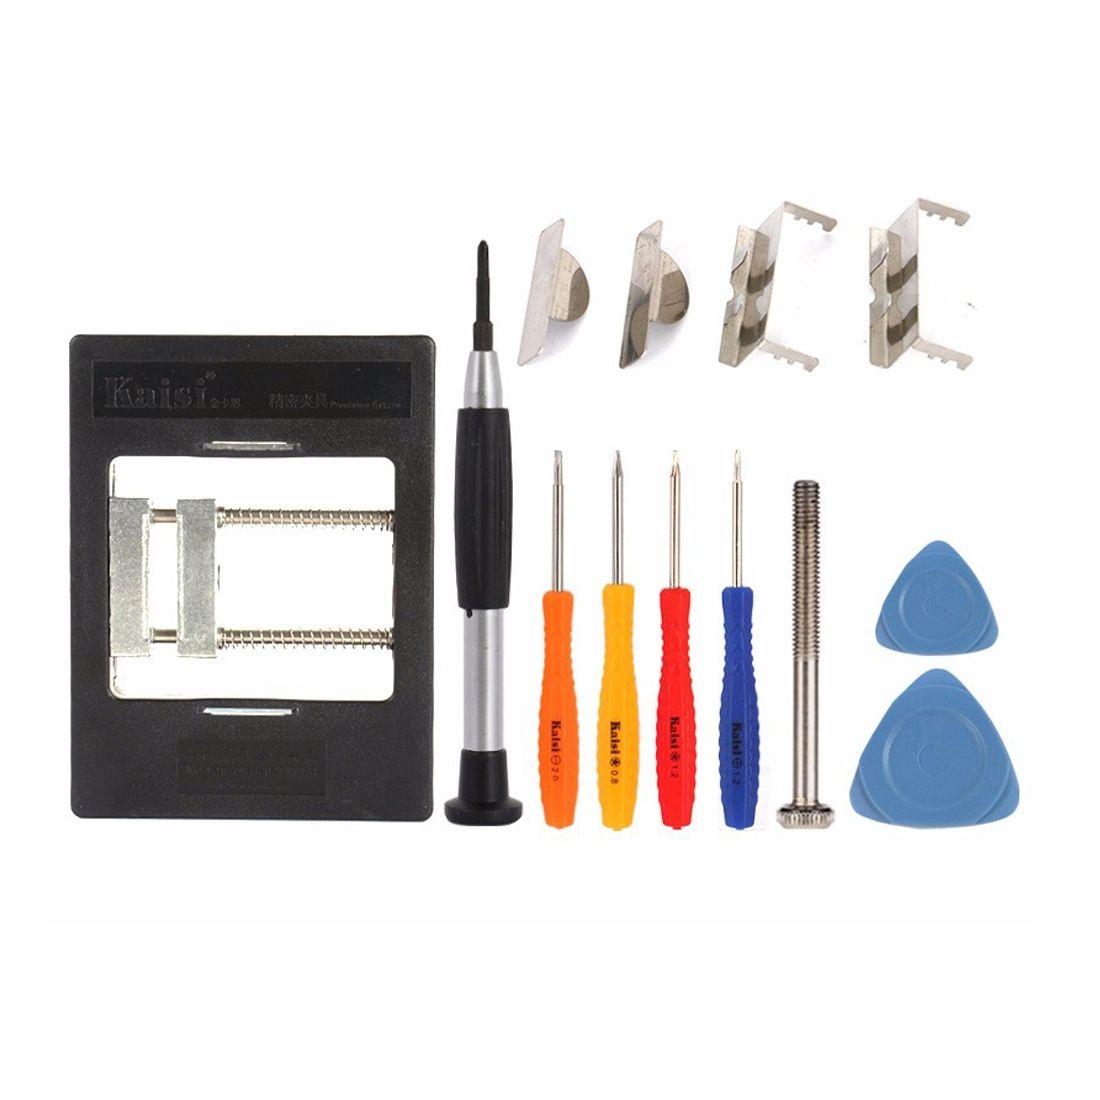 Universal Kaisi 1200 Precision Fixture Bga Pcb Rework Station Holder Details About Circuit Board Tool Fixtures Repair Kit For Generic Ks 13 In 1 Set